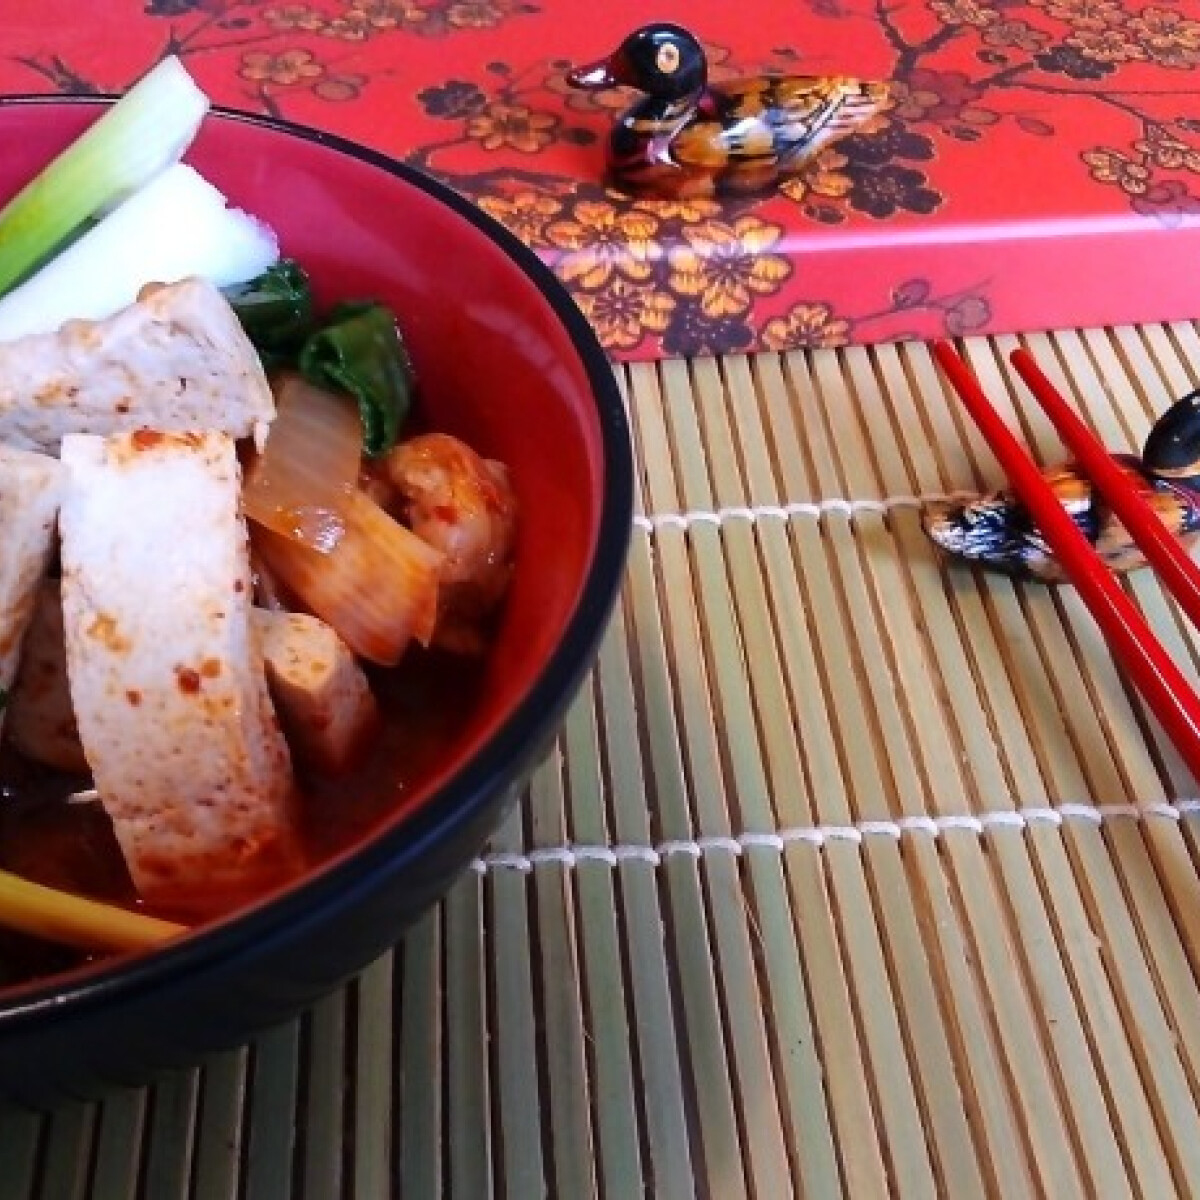 Koreai kimchipörkölt - Kimchi jiggae